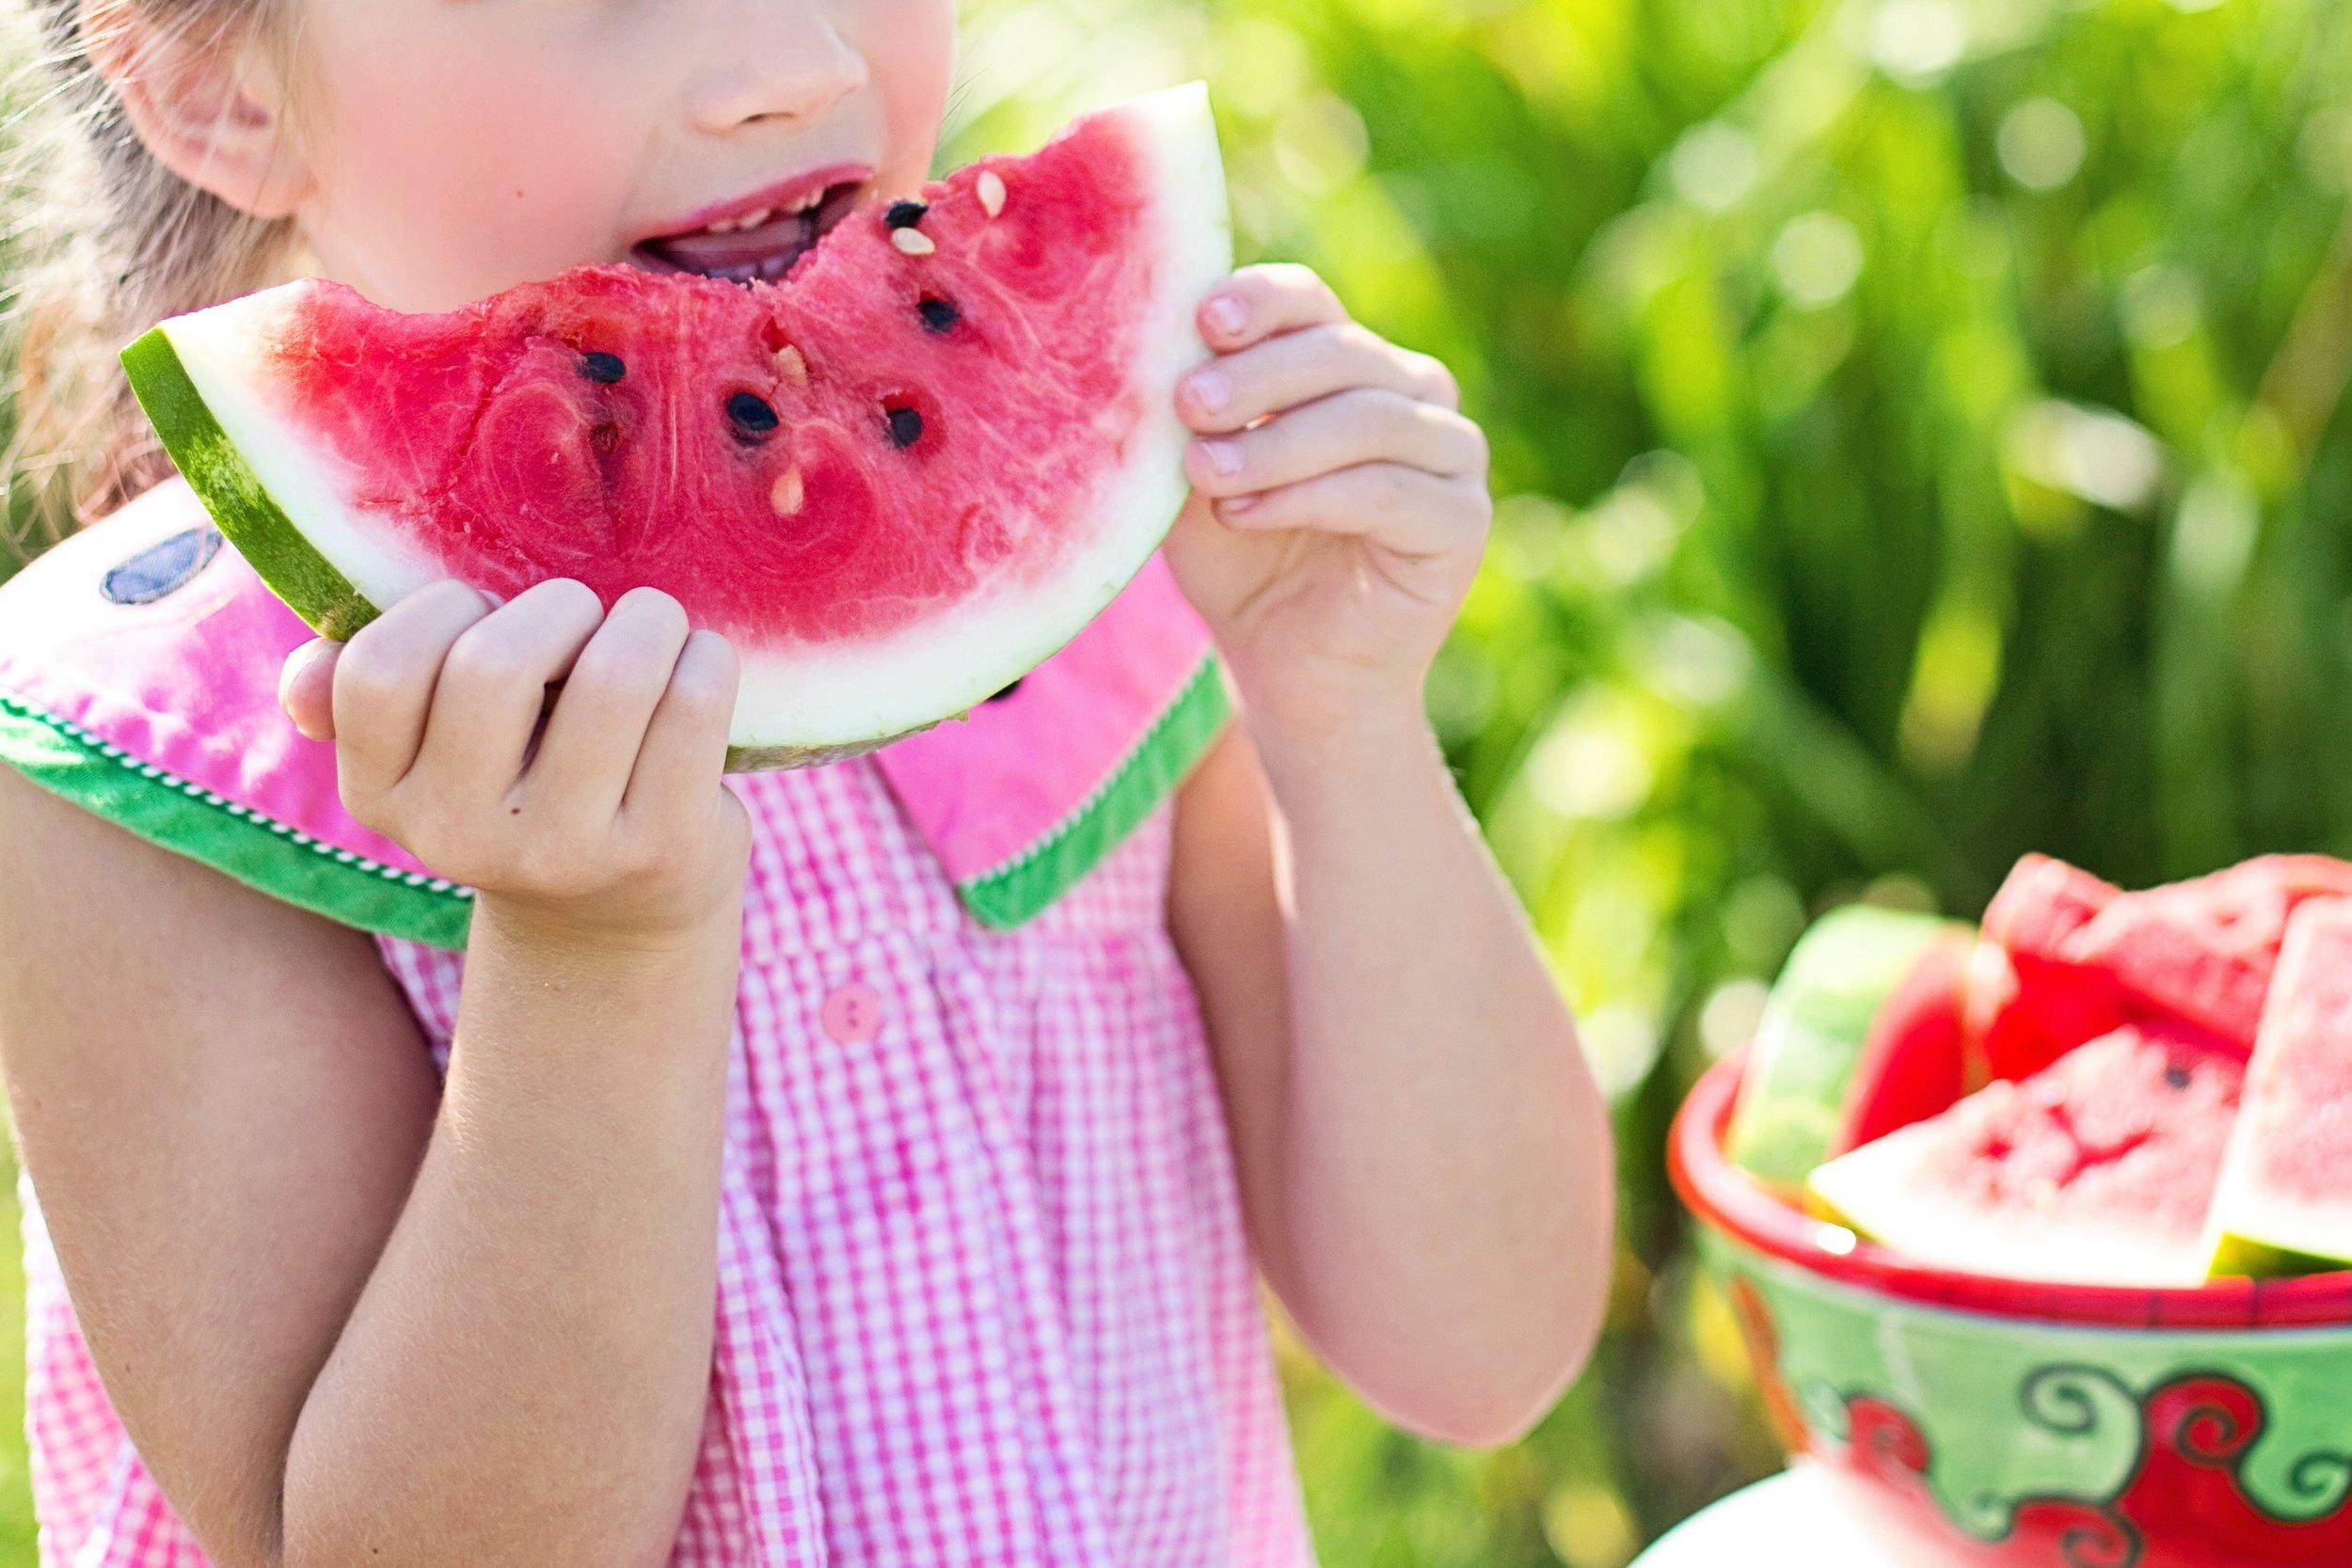 child-eating-watermelon.jpg